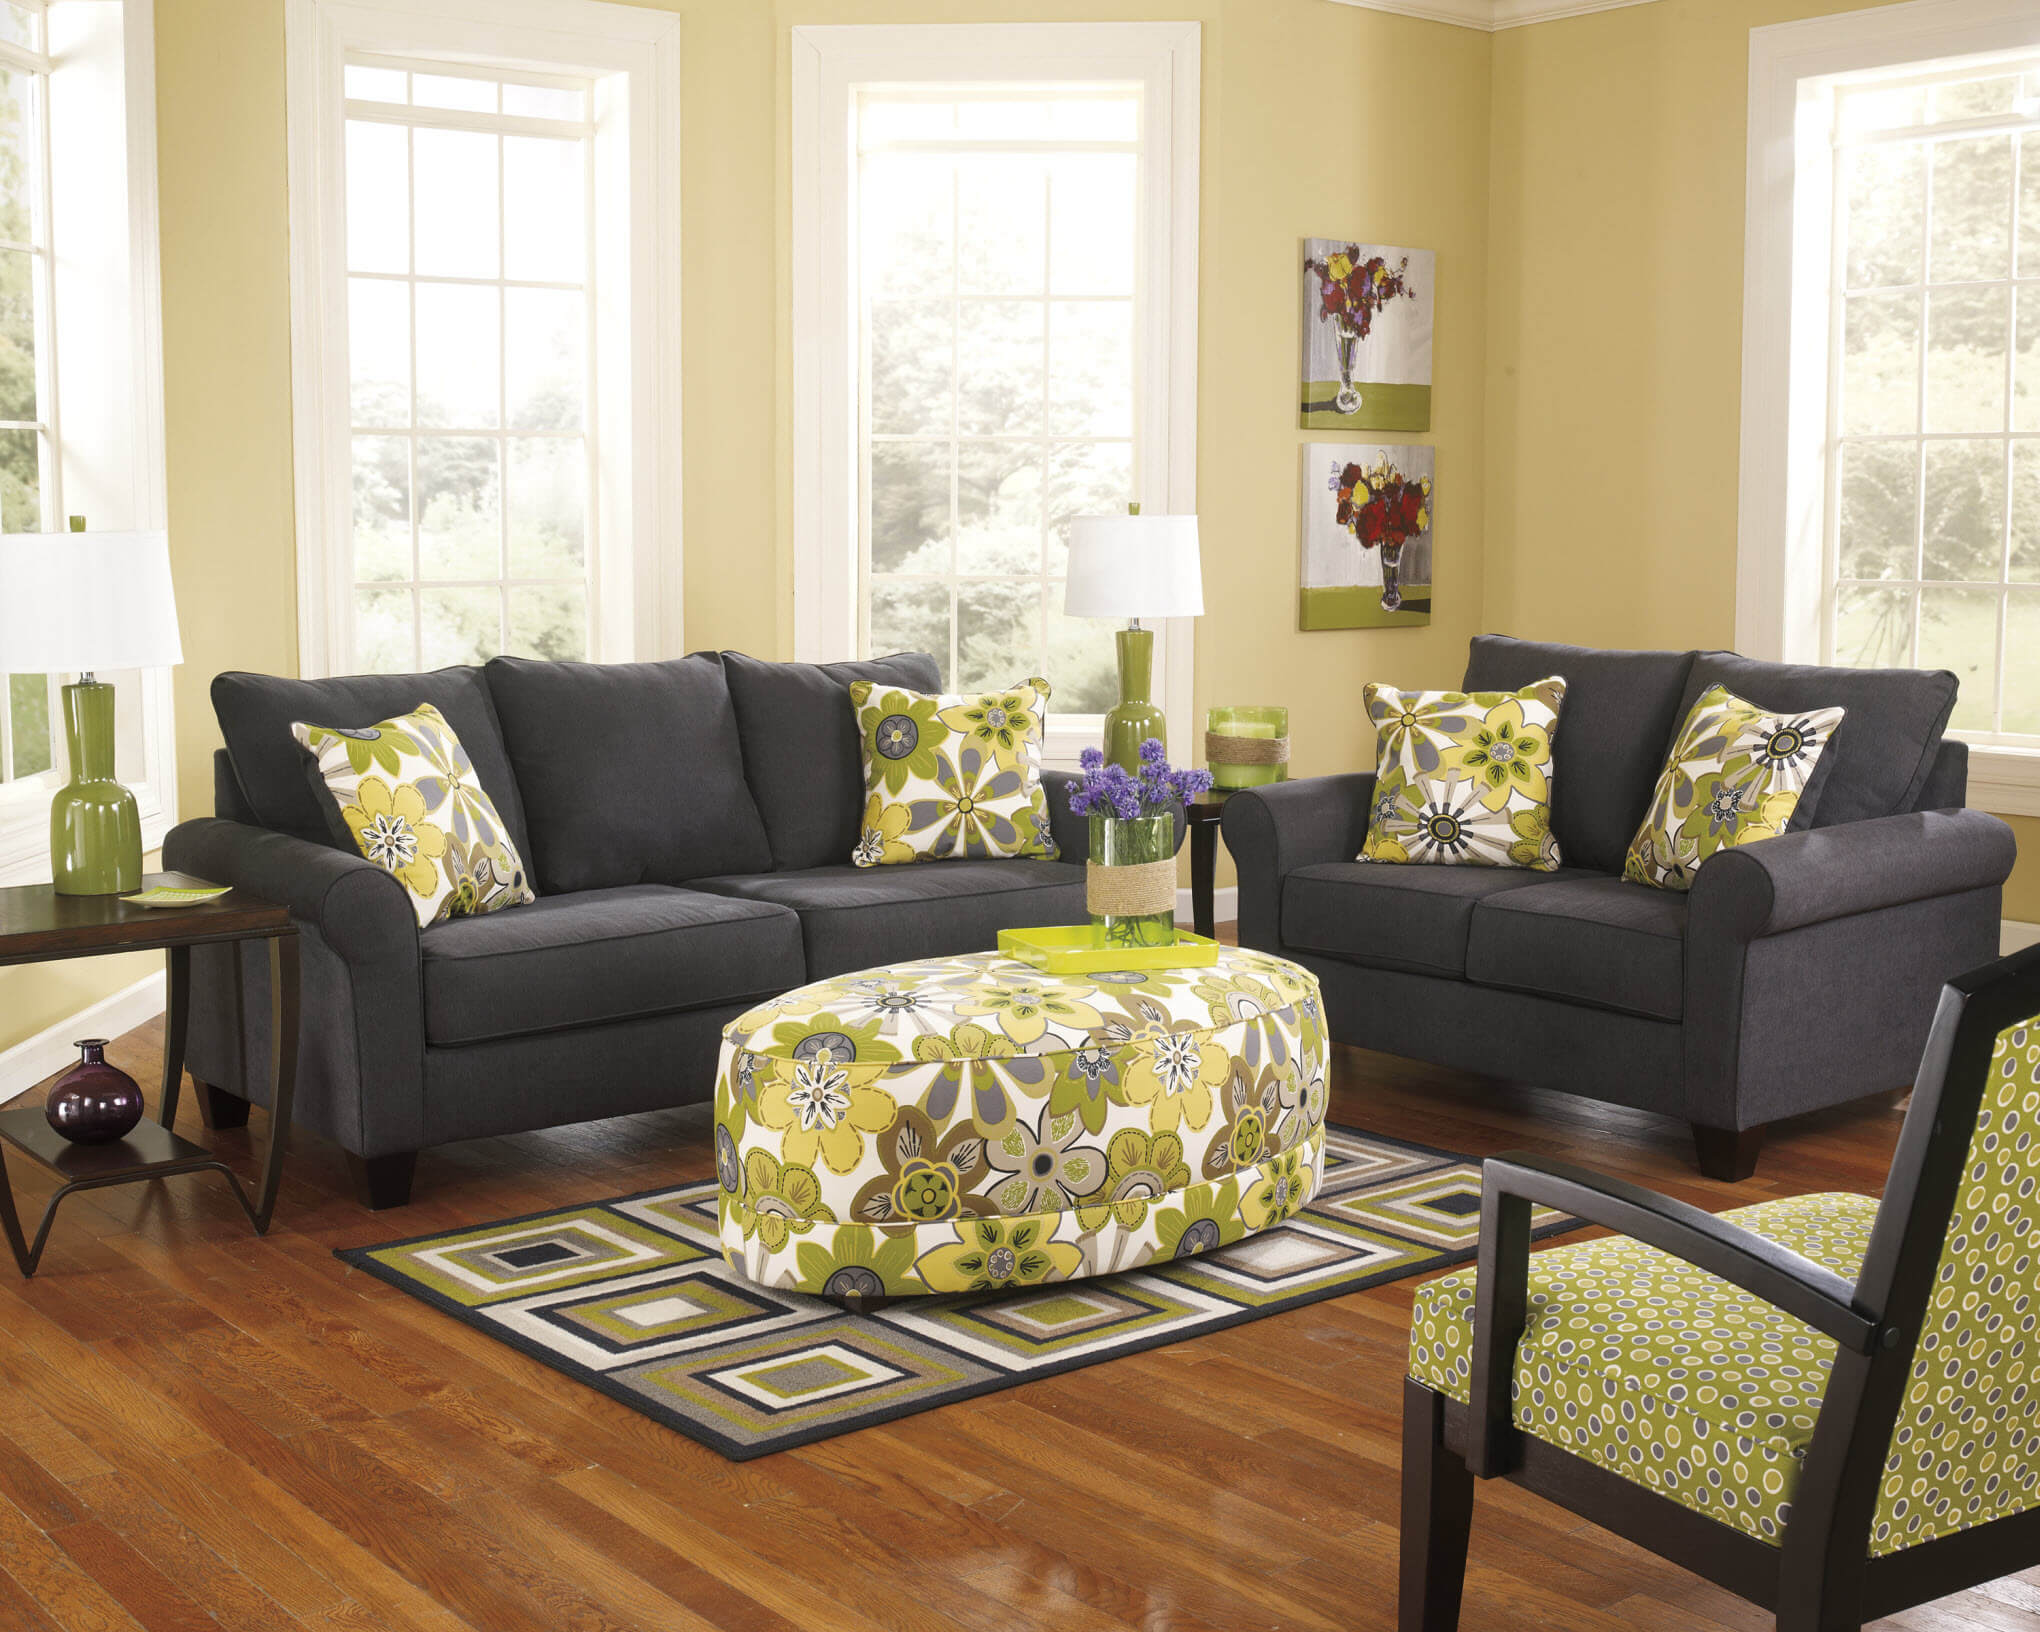 Nolana Charcoal Sofa and Loveseat Fabric Living Room Sets